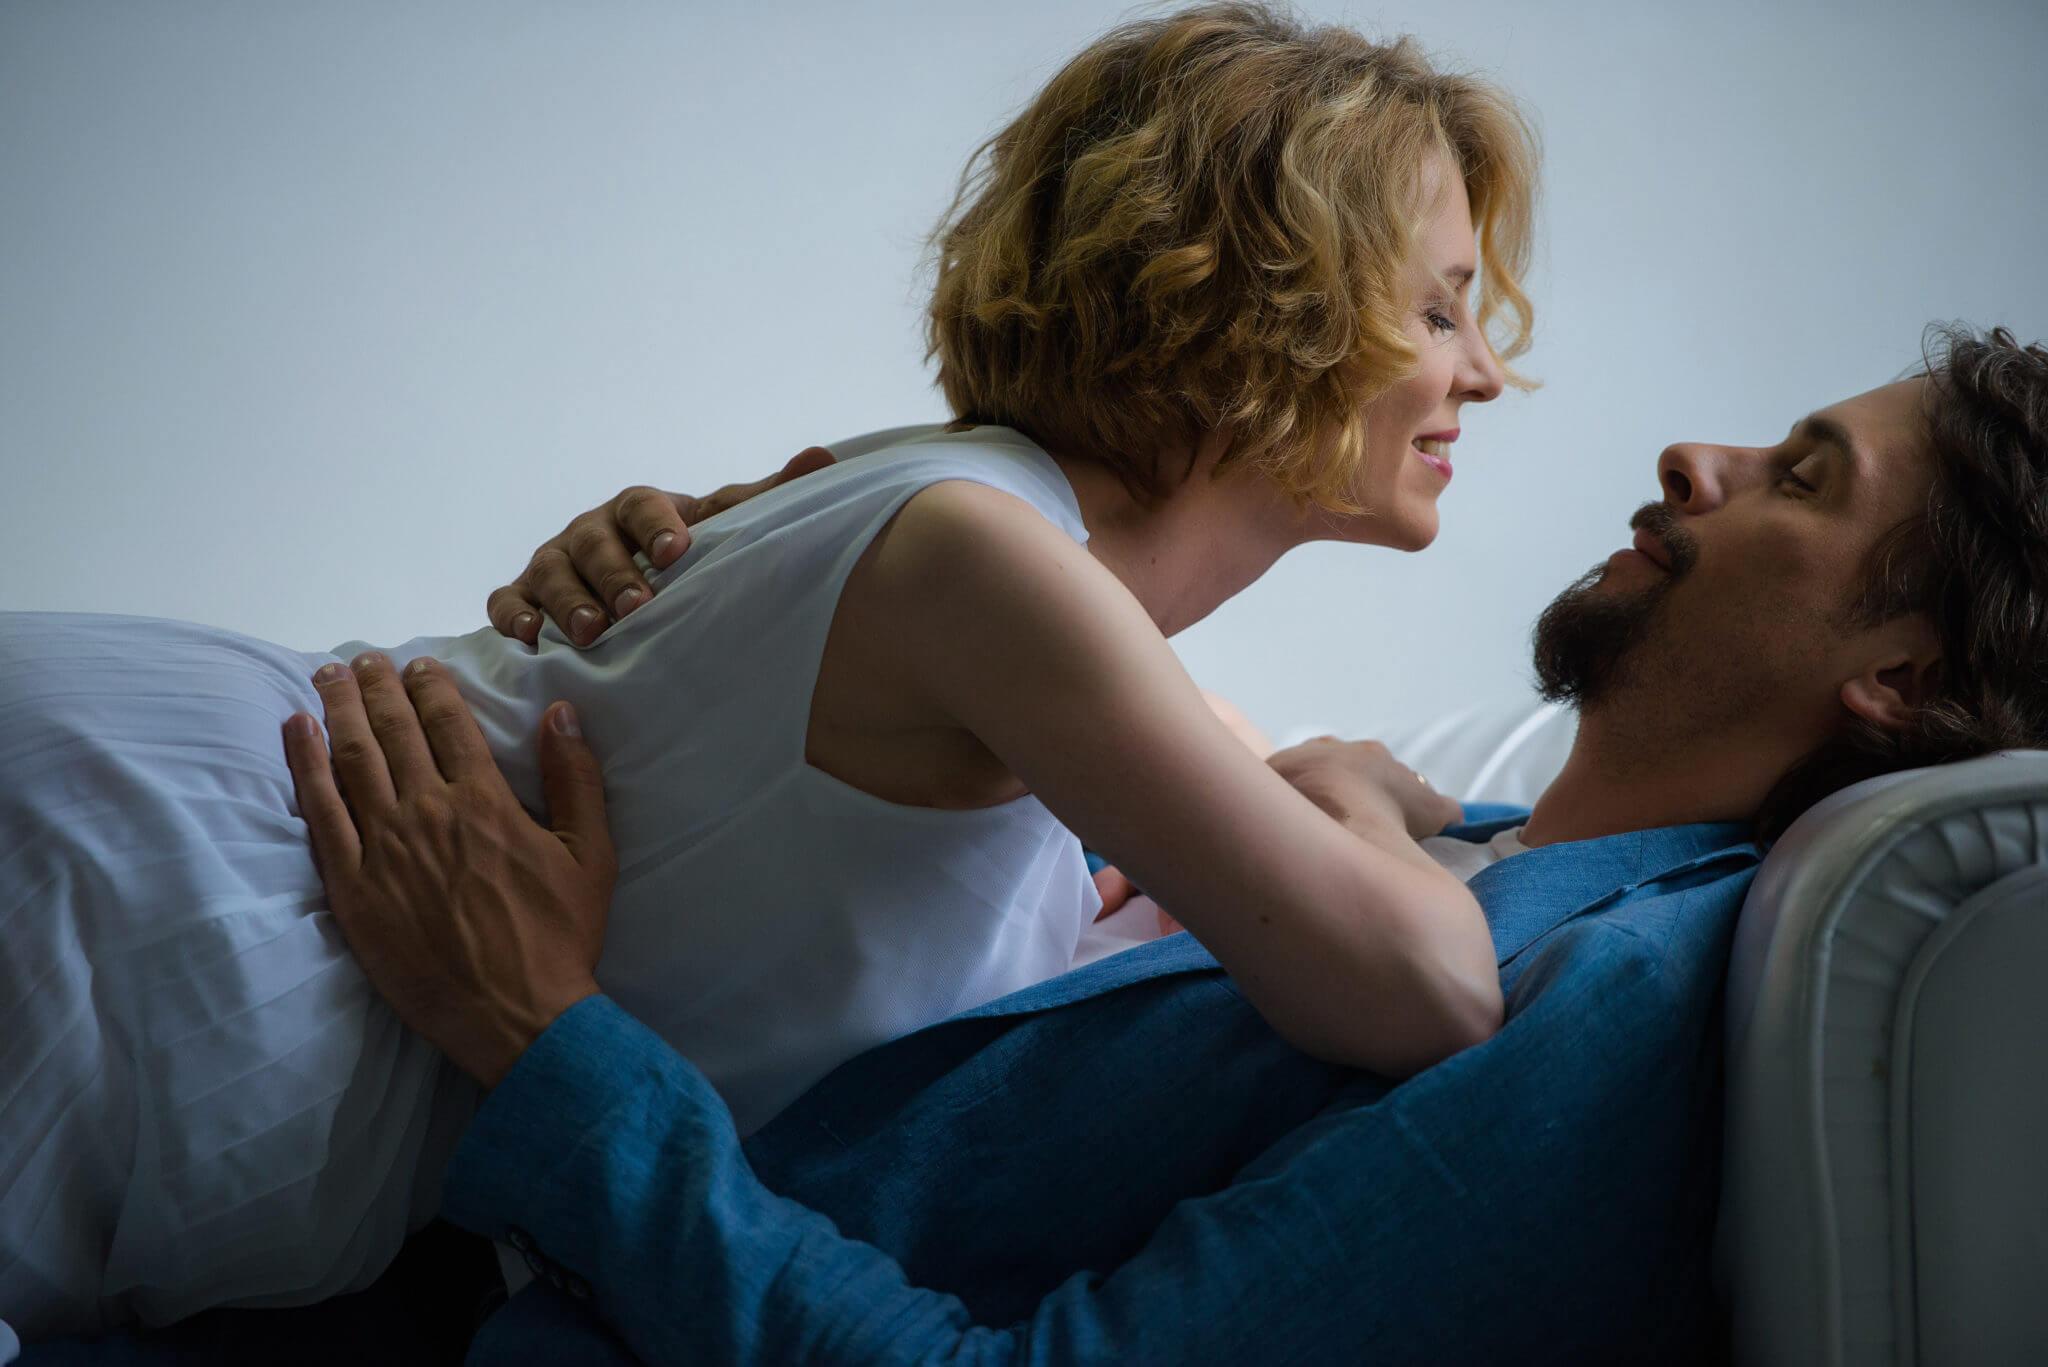 Фотосессия Love Story в студии, пара на диване